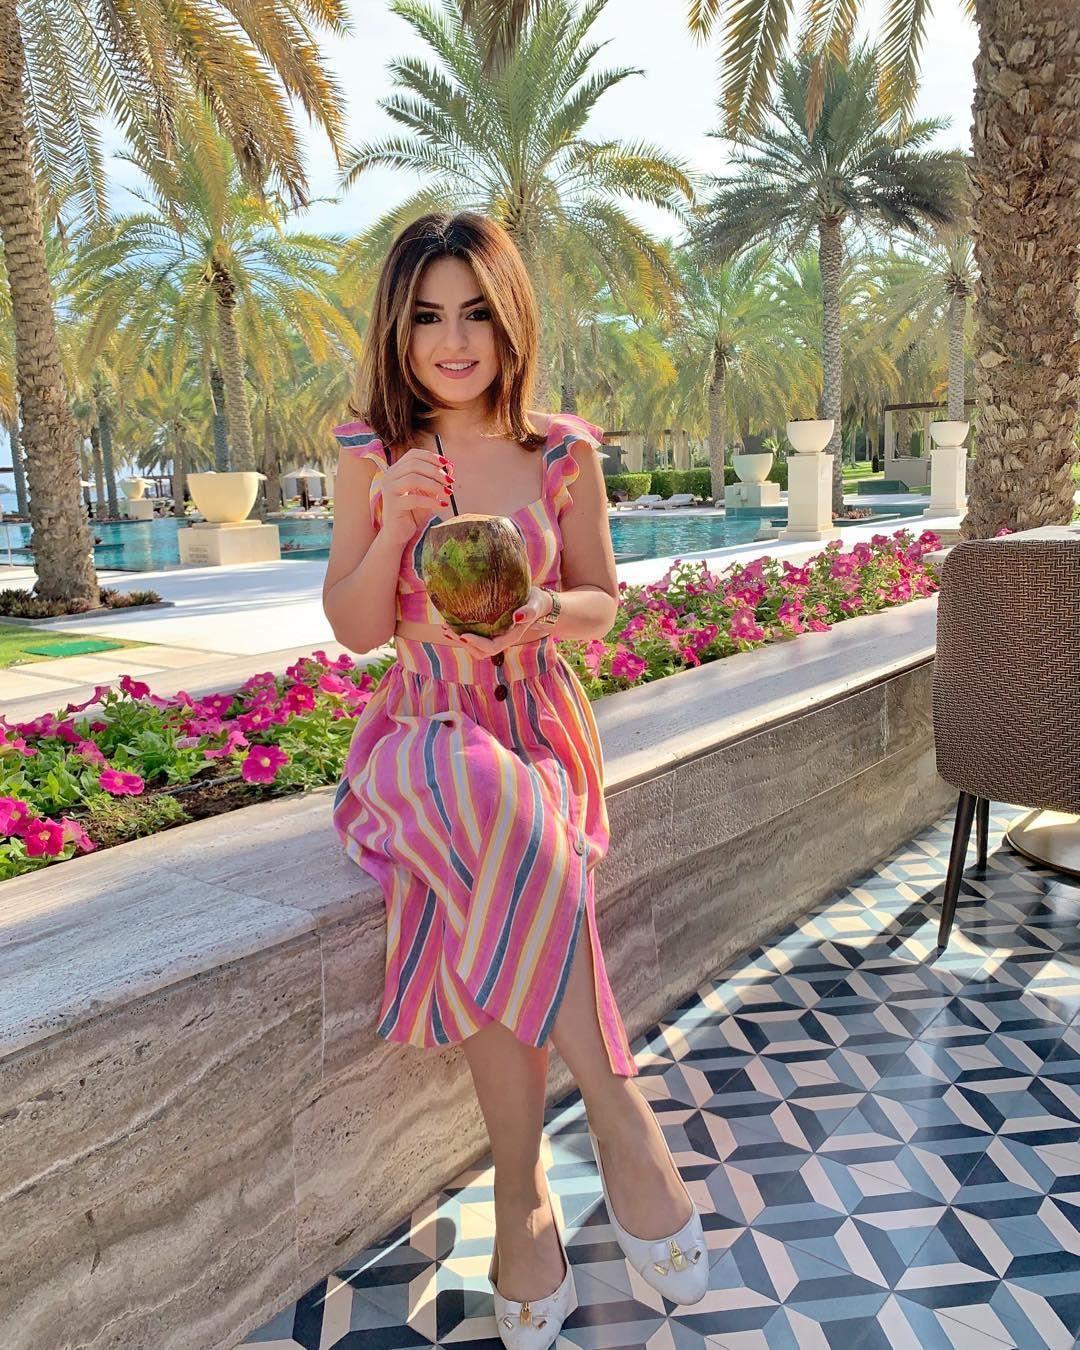 Safa Srour صفا سرور On Instagram Morning Like This Albustanpalace Muscat صباح الحب مني الكم يا احلا صبايا Lily Pulitzer Dress Pulitzer Dress Fashion